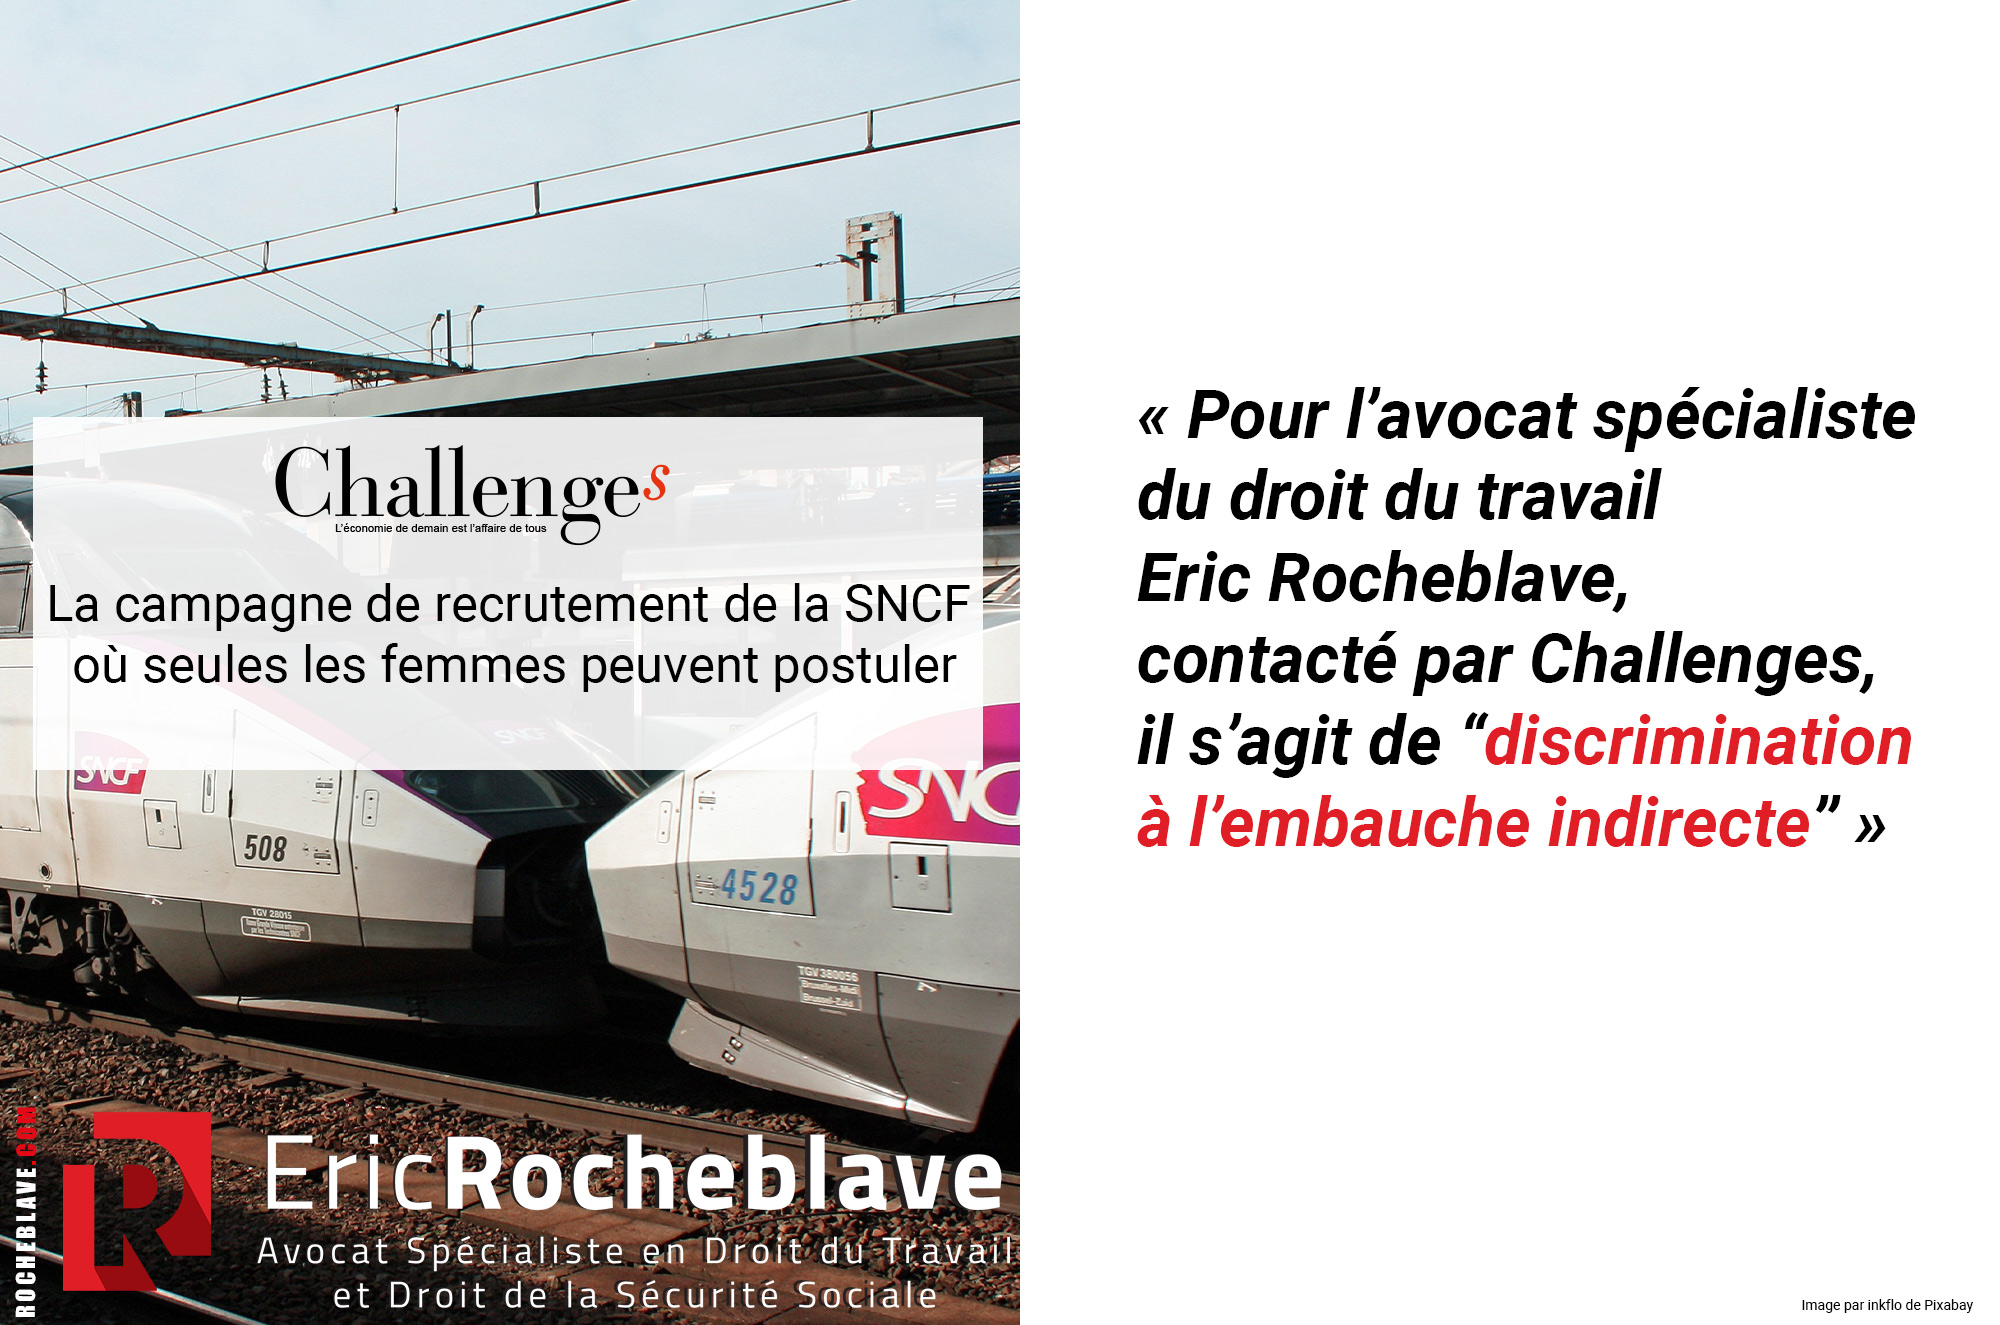 La campagne de recrutement de la SNCF où seules les femmes peuvent postuler